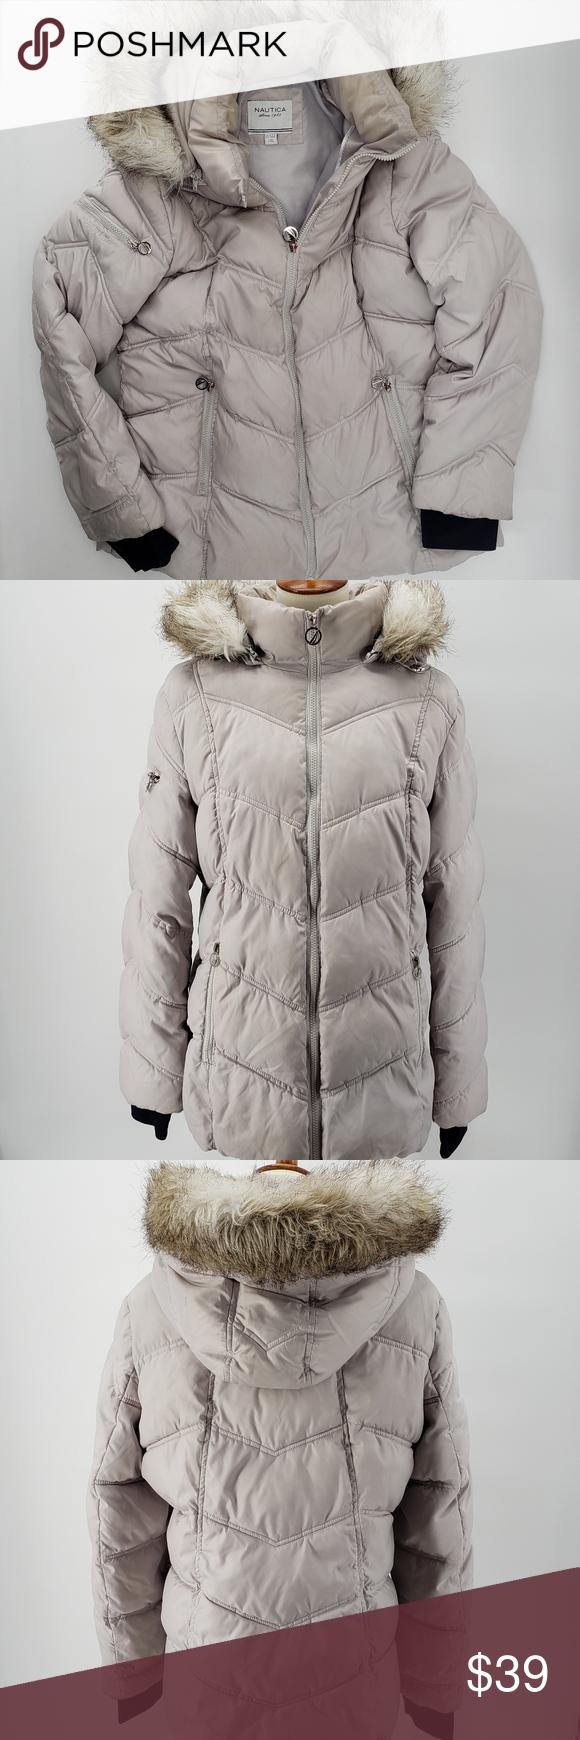 Nautica Winter Hooded Puffer Jacket Size L Puffer Jackets Jackets Nautica [ 1740 x 580 Pixel ]